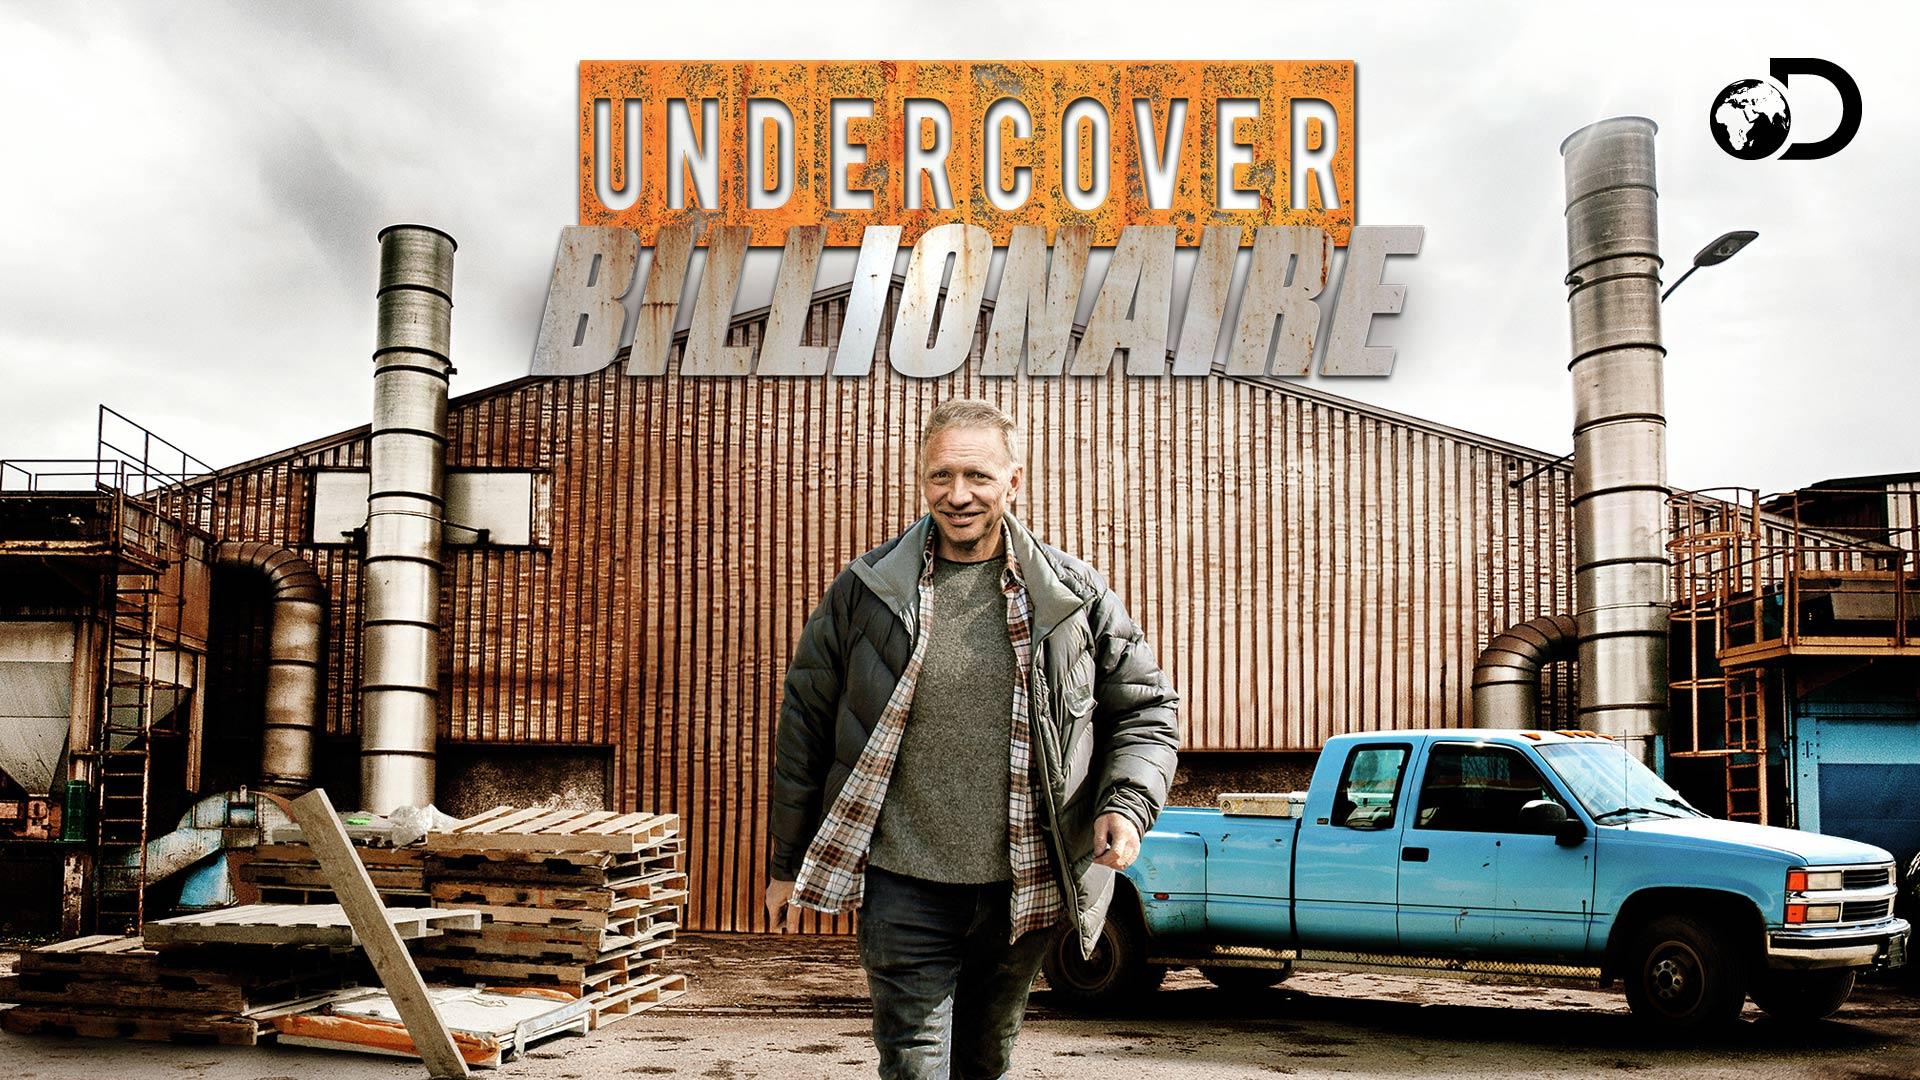 Undercover Billionaire Season 1